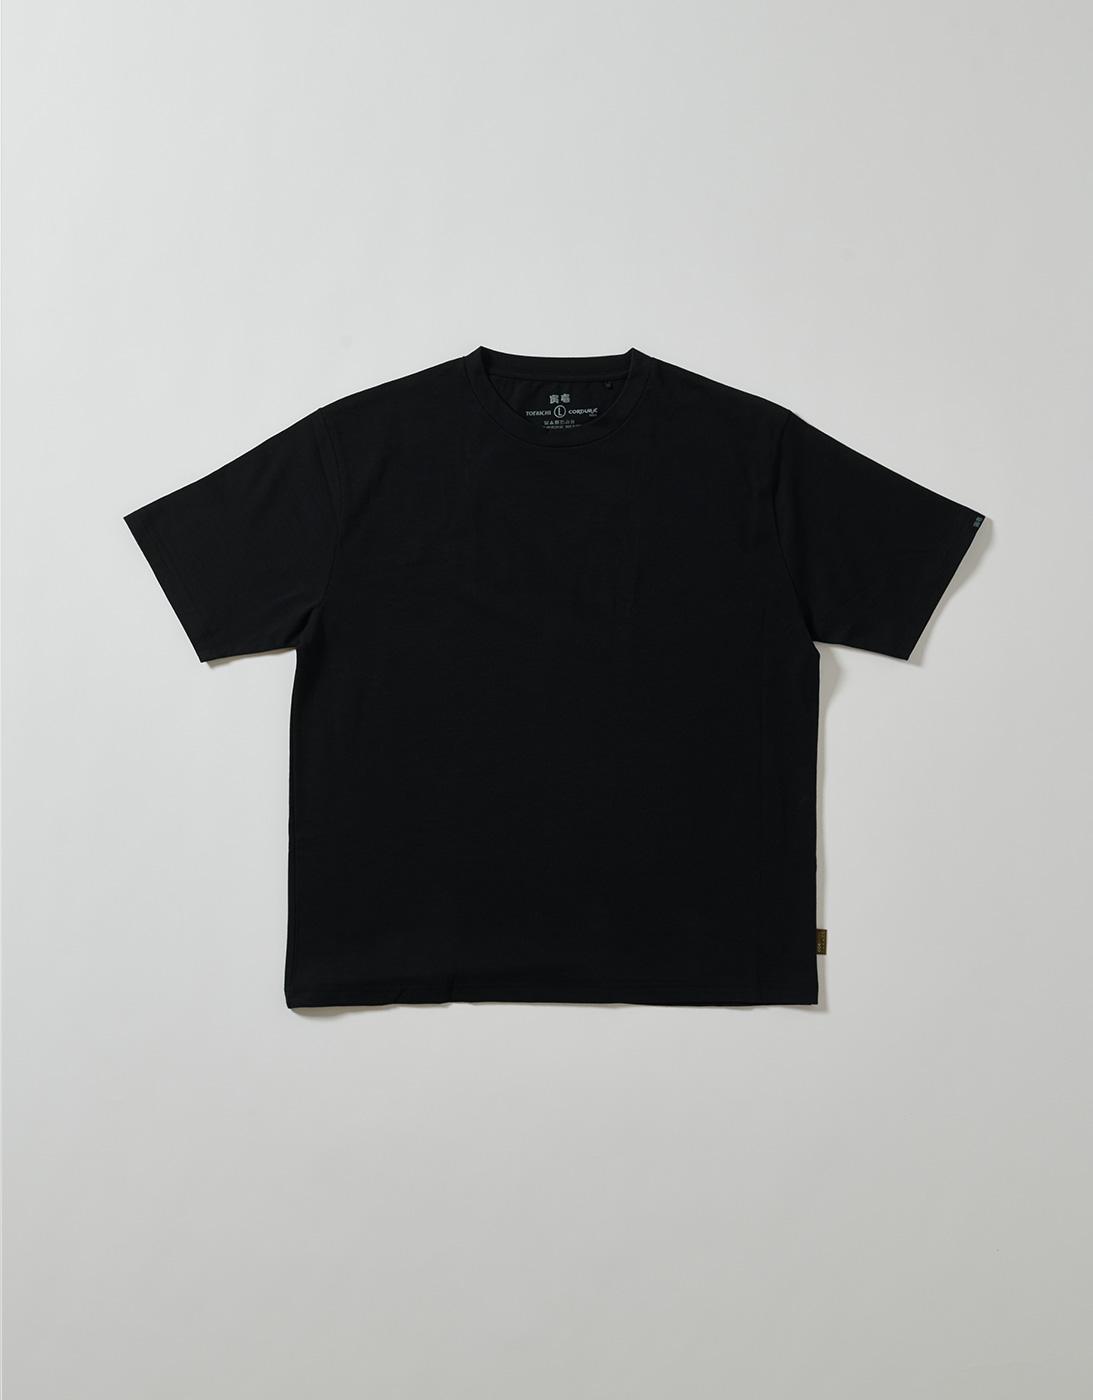 S/S WORK T-SHIRTS 9523-619 BLACK